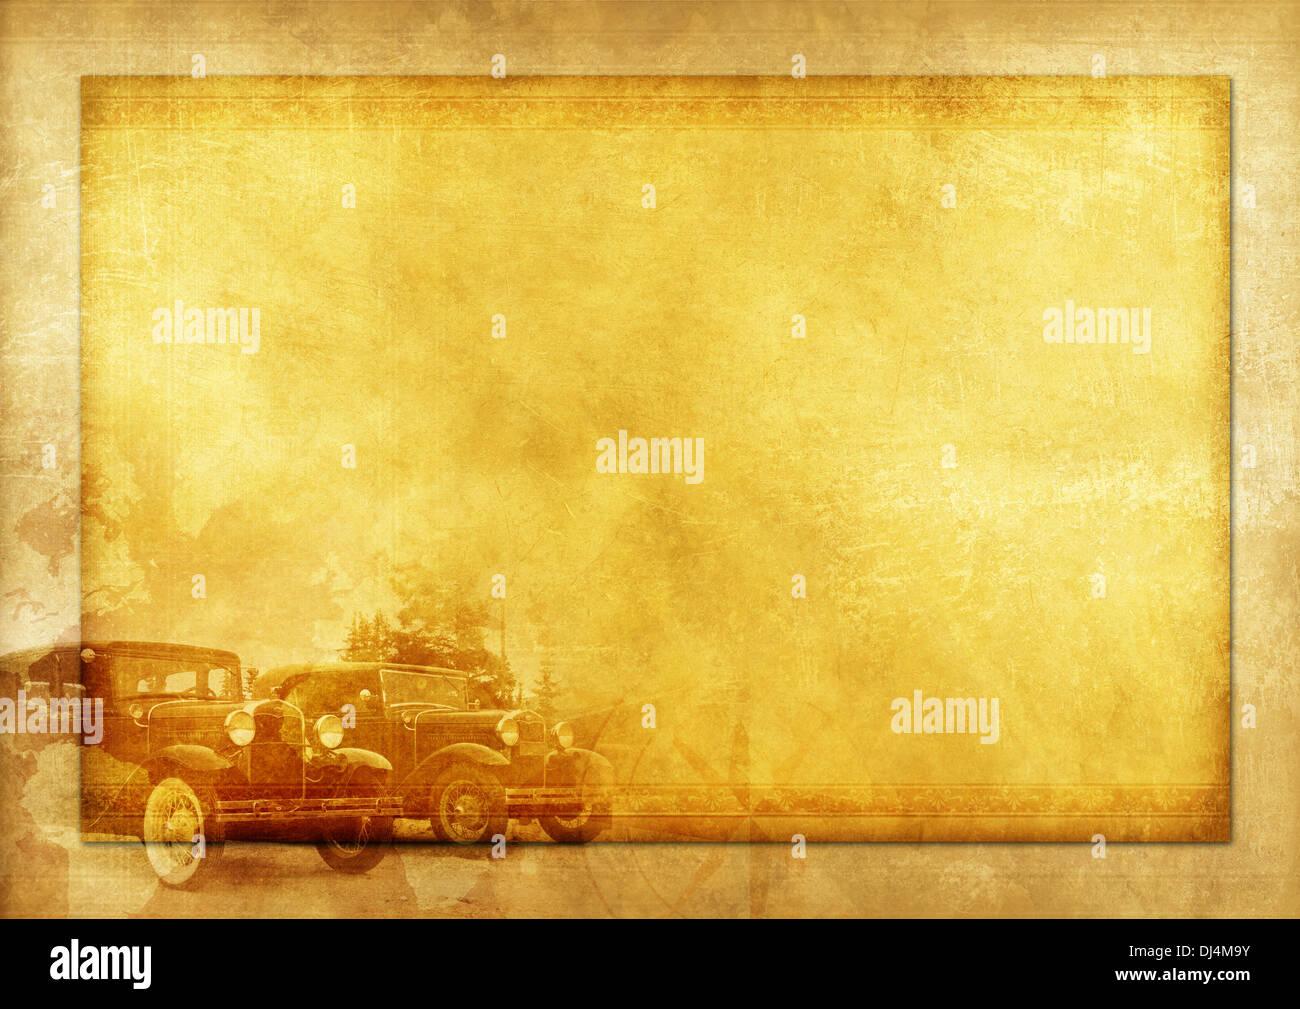 Transportation History Vintage Background Illustration With Two